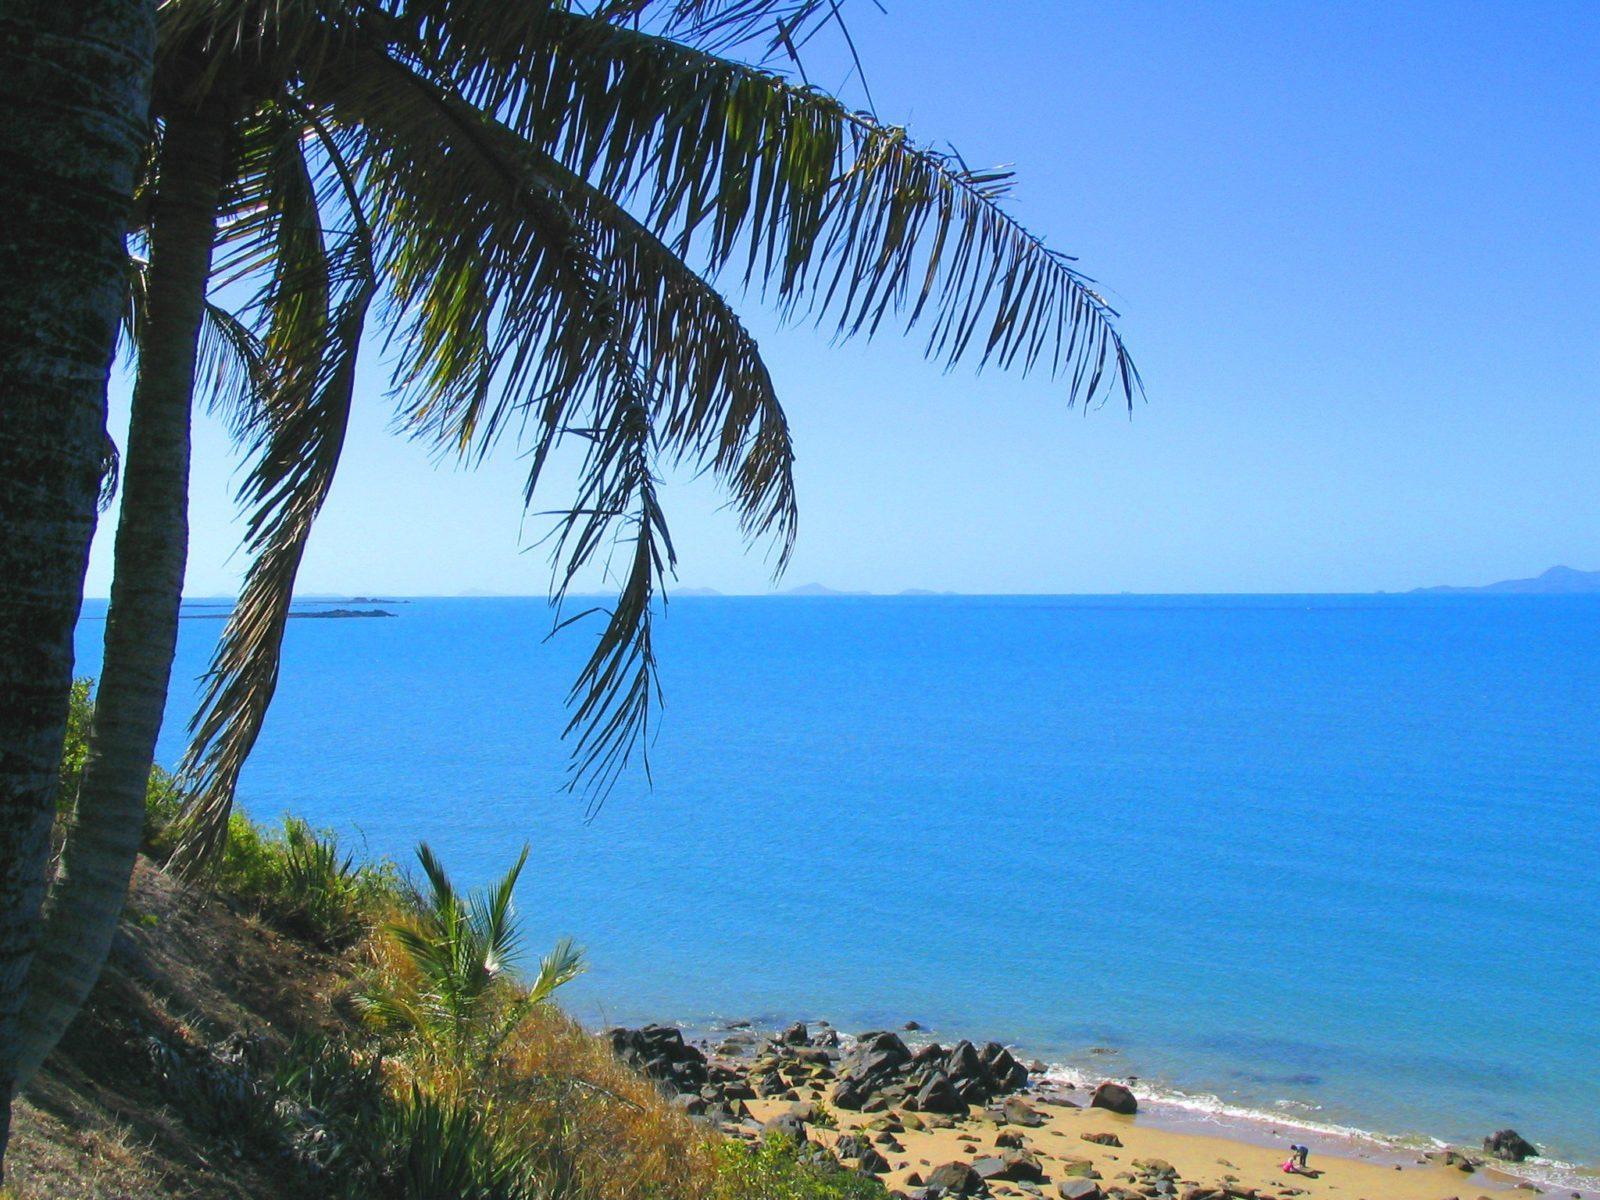 Eimeo Beach